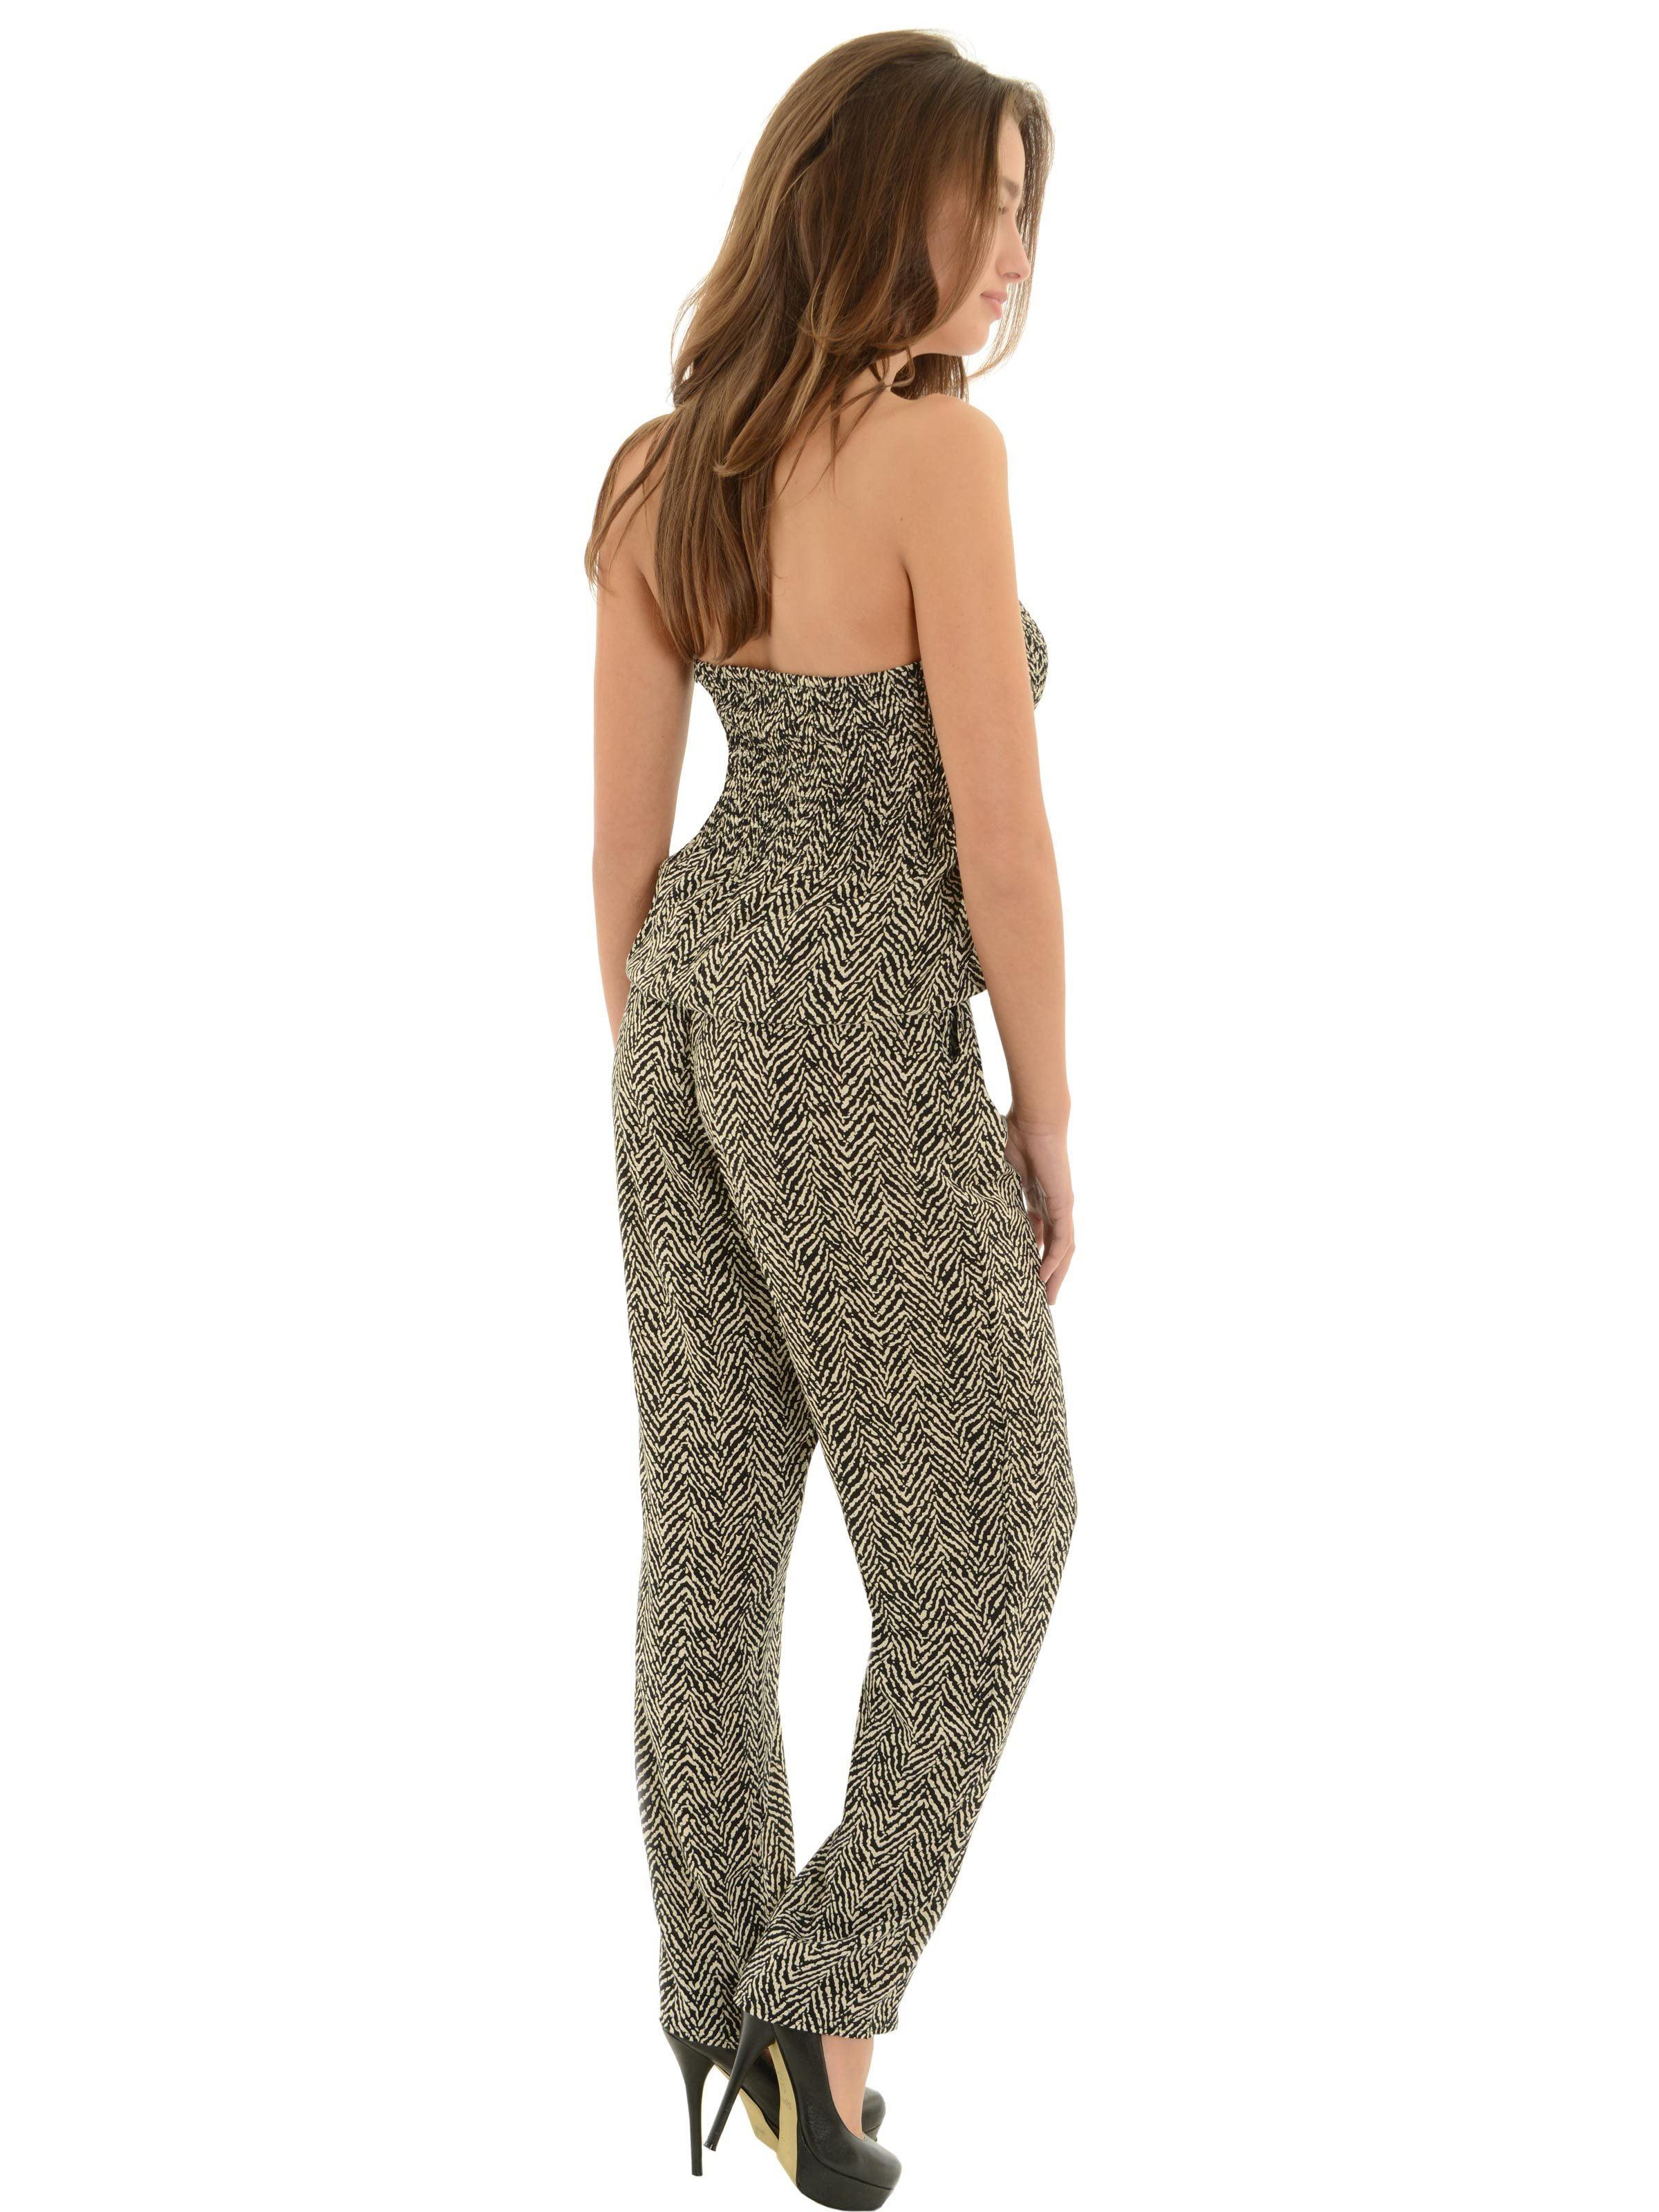 b12a0ad8f9e0 India B - Womens Long Pants Romper with Pockets Strapless Jumpsuit Black  Cream Chevron - Walmart.com